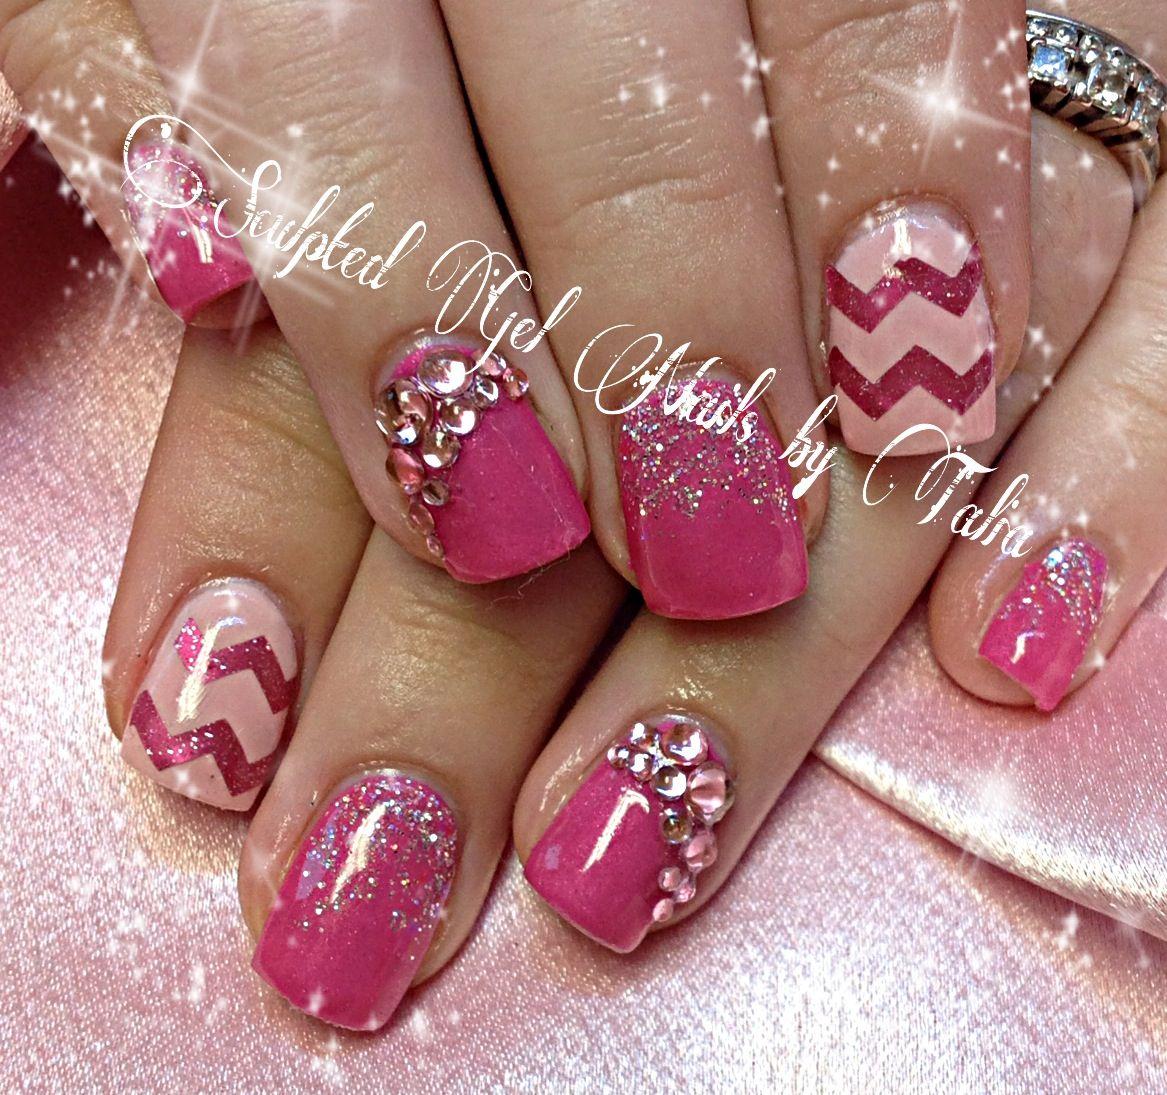 Chevron nail art | Nails | Pinterest | Chevron nail art, Nail nail ...